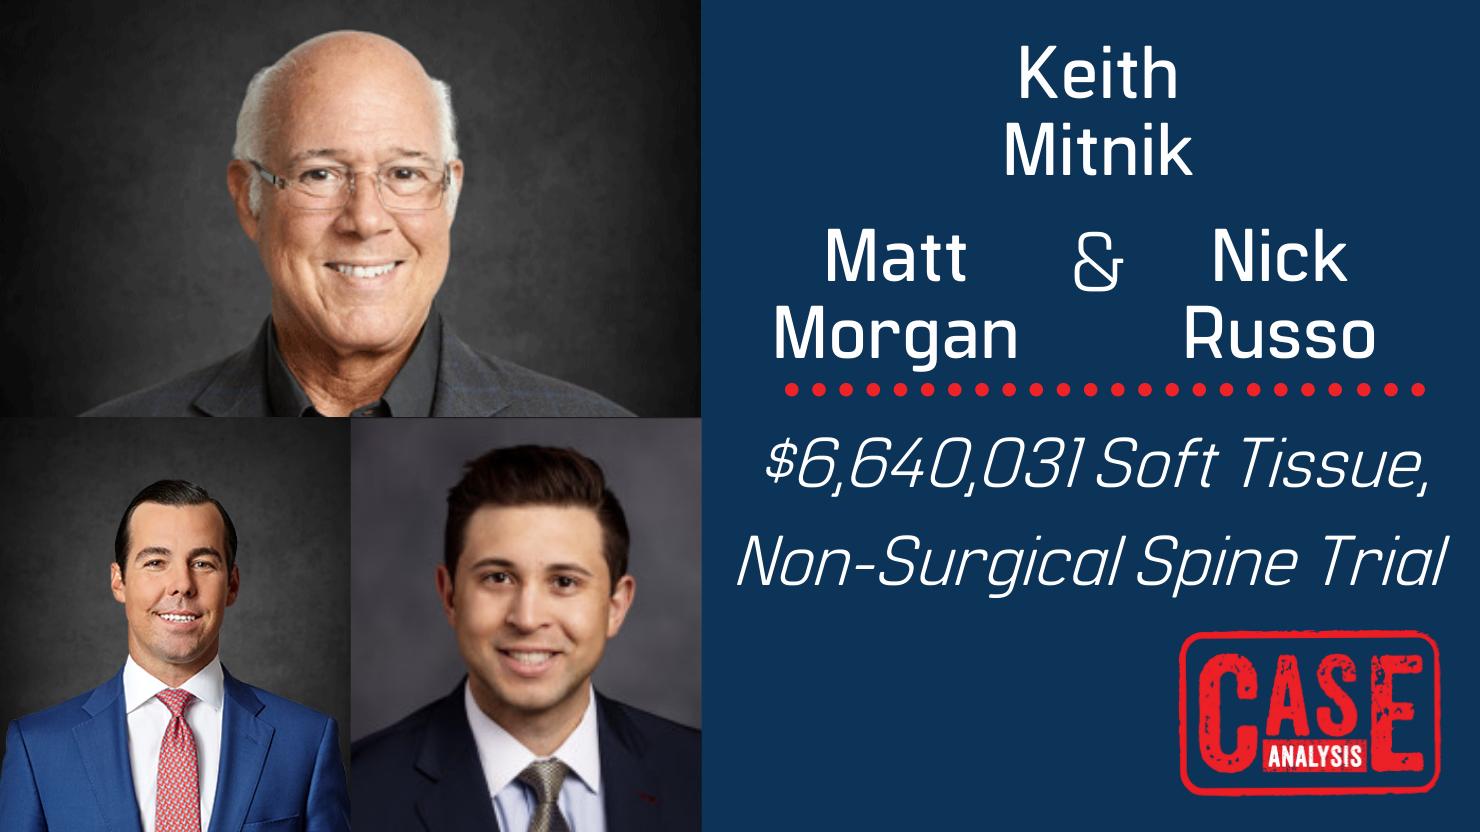 Keith Mitnik, Matt Morgan & Nick Russo - $6,640,031 Soft Tissue Non-Surgical Spine Trial